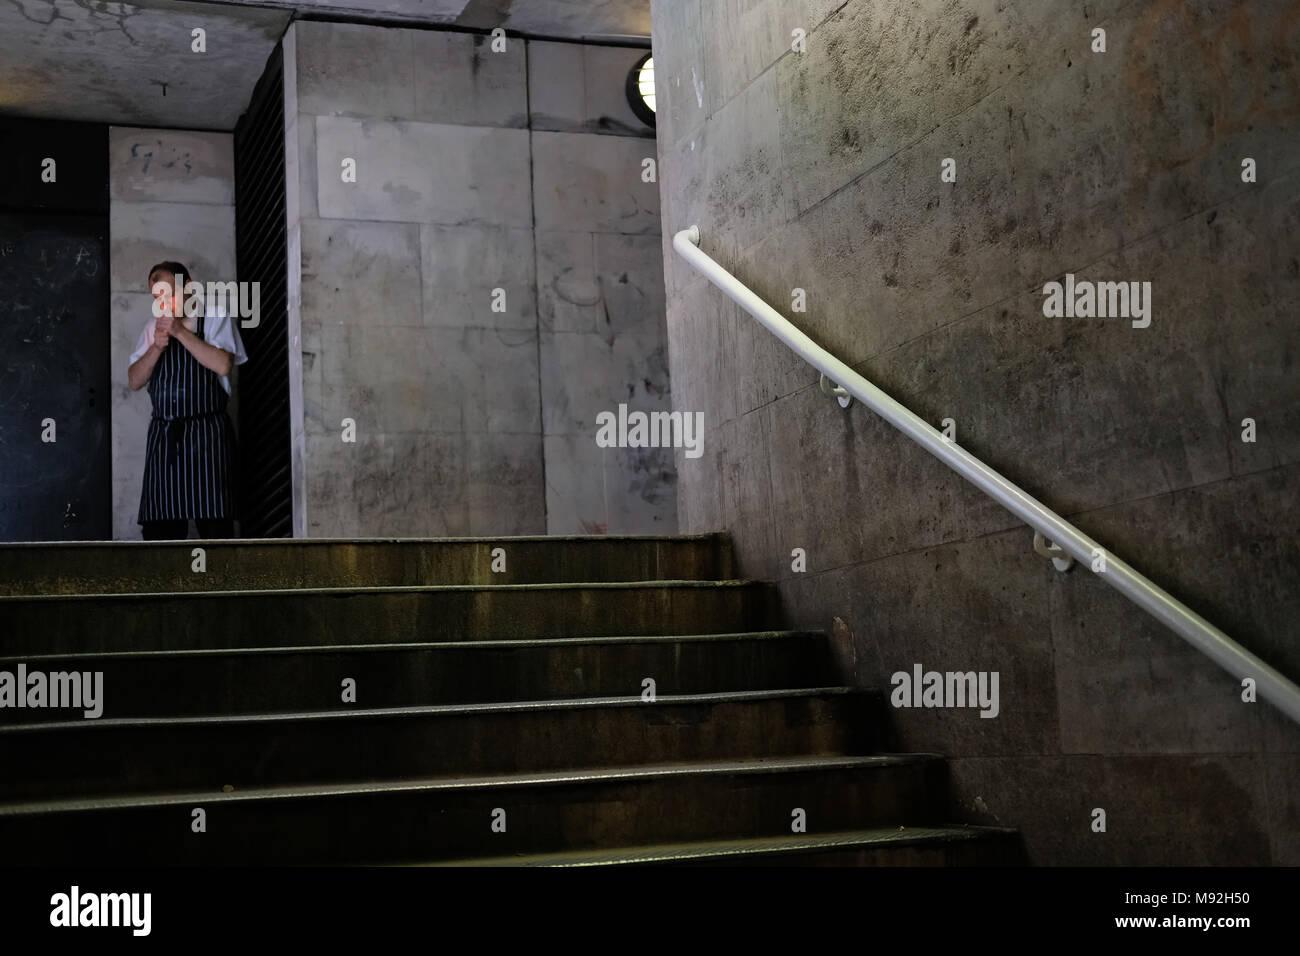 Man smoking in London underpass. - Stock Image